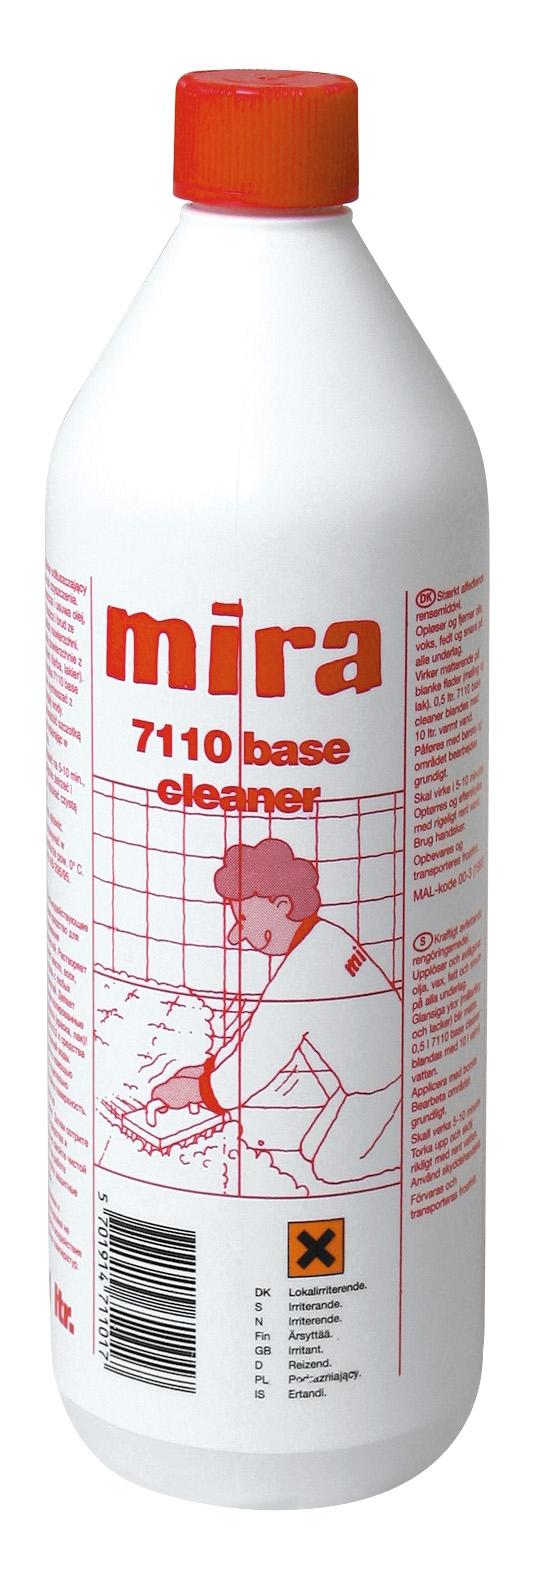 MIRA 7110 BASE CLEANER koncentrat srodek odtluszczajacy